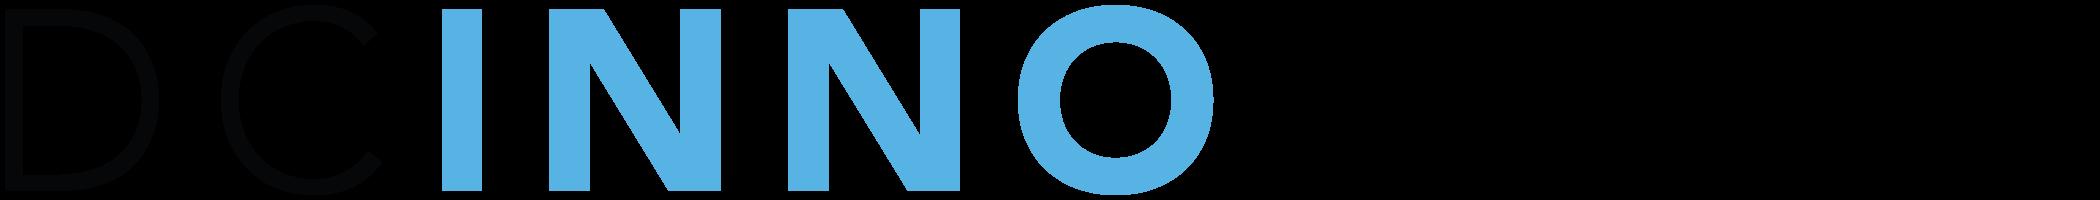 DC Inno_Logo